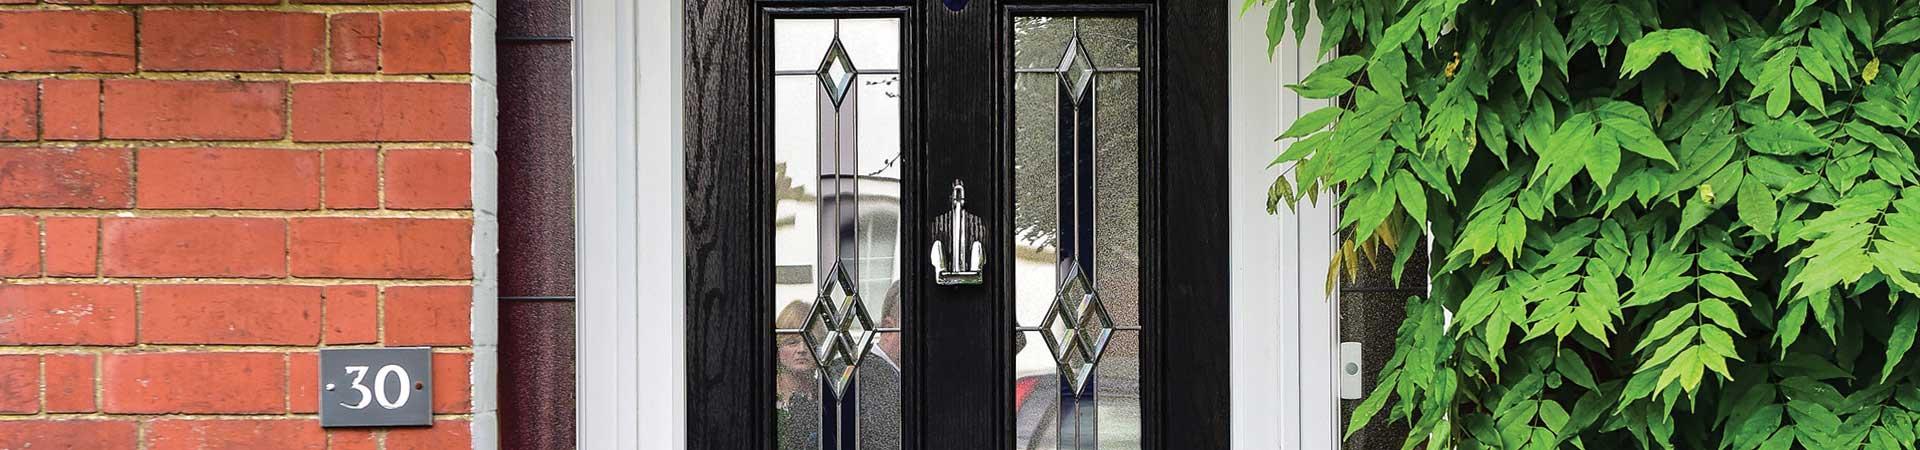 bespoke double glazing